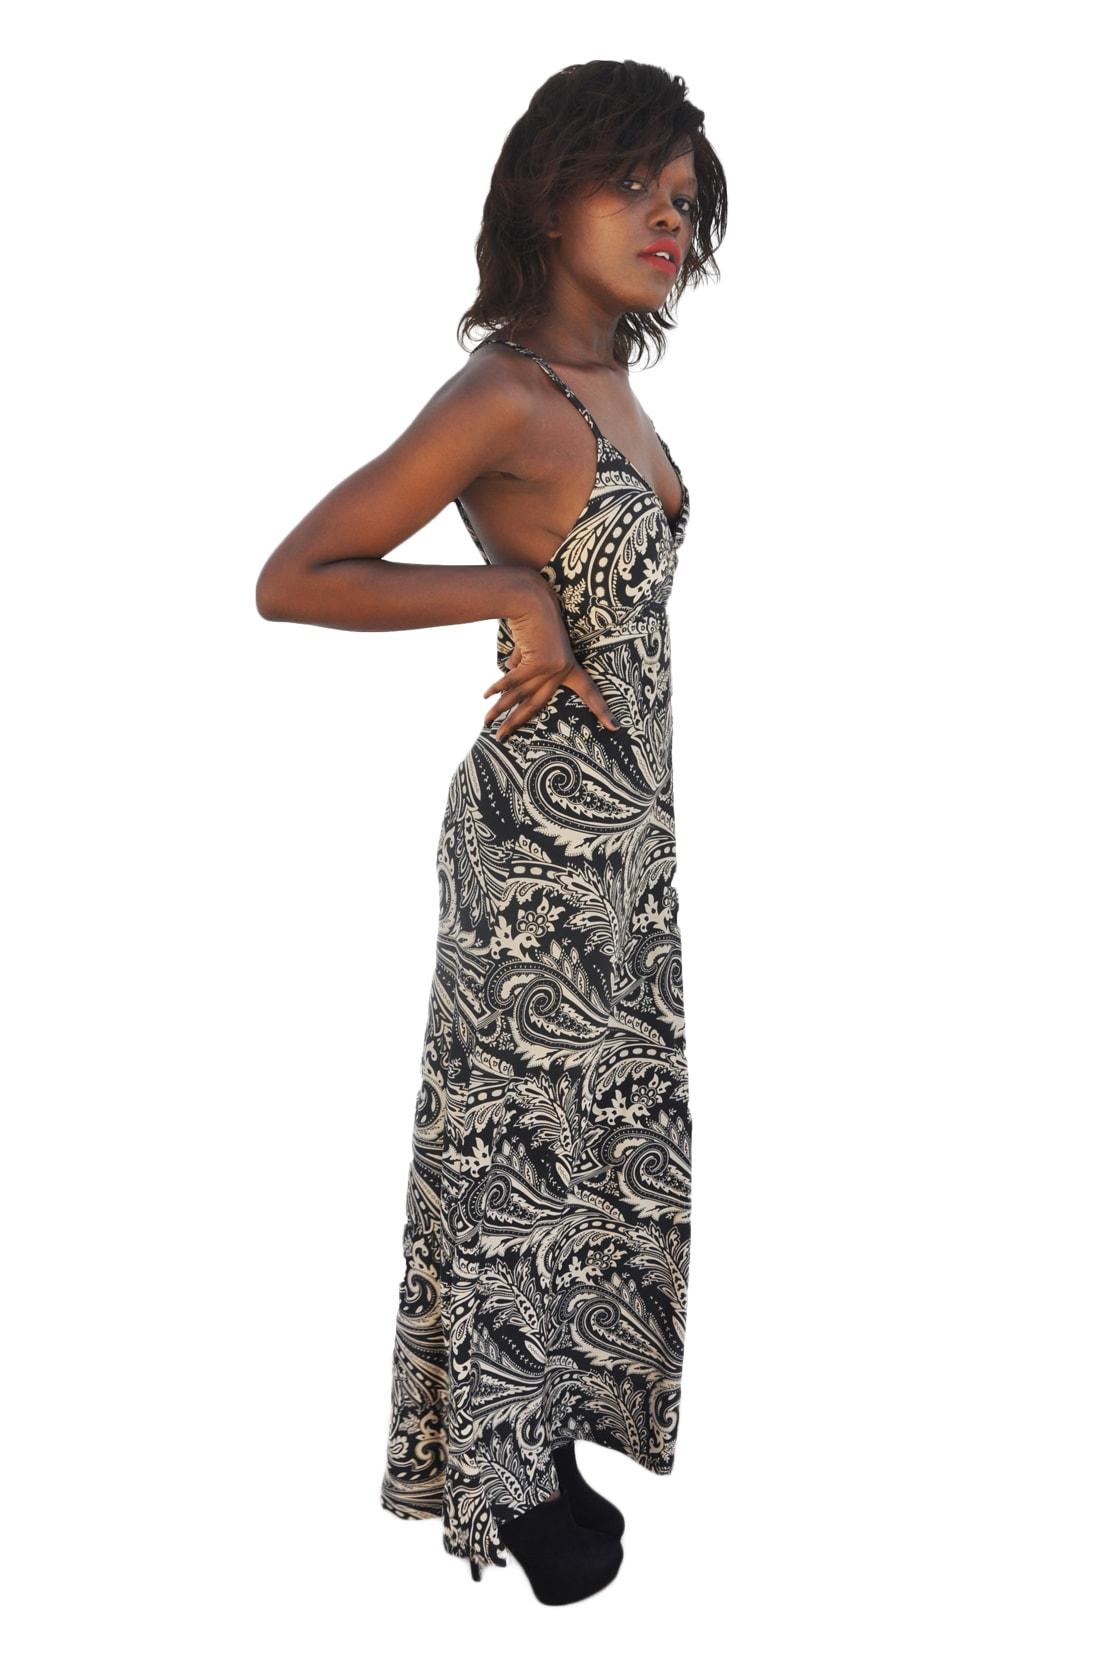 M0163 black3 Leisure Dresses maureens.com boutique